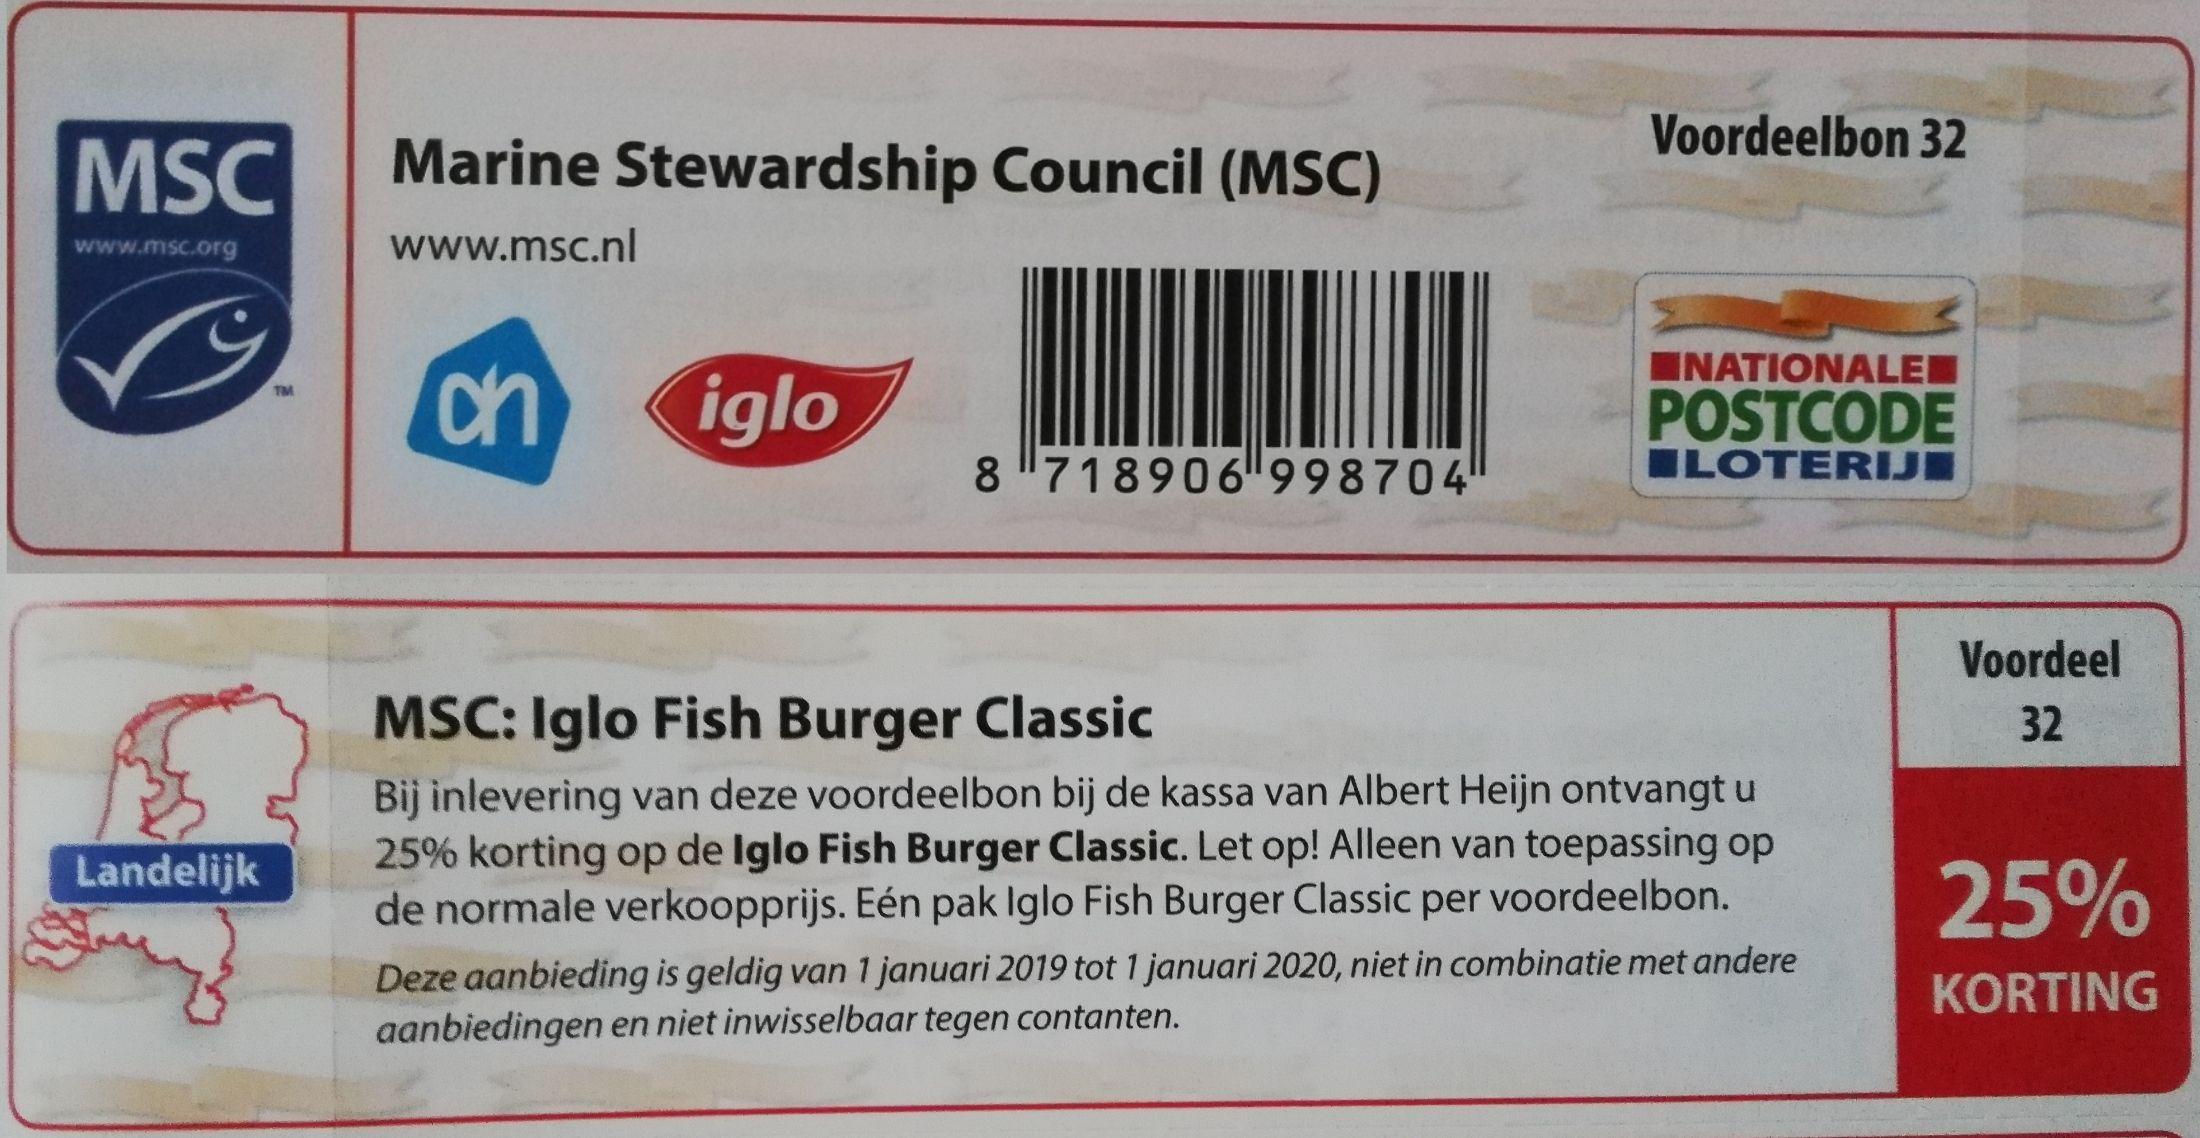 25% korting op MSC: Iglo Fish Burger Classic